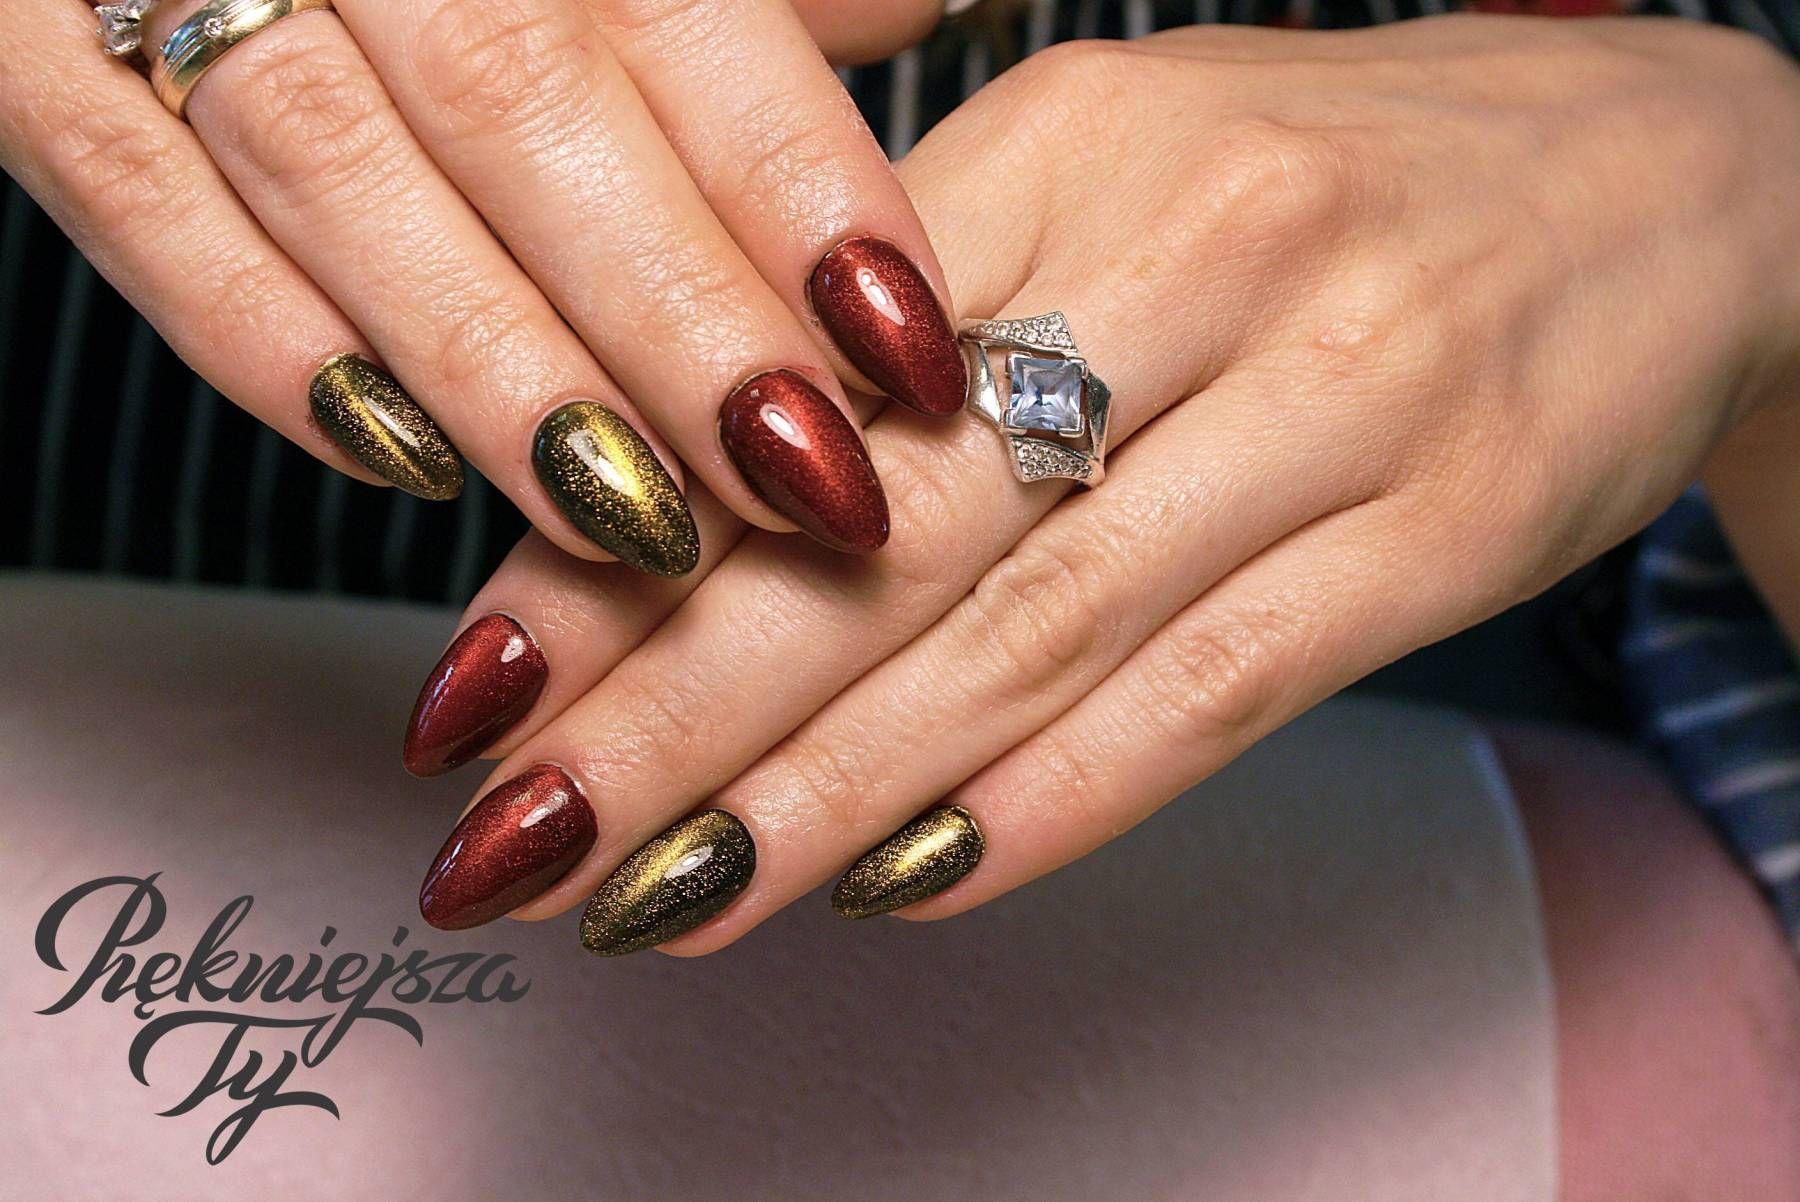 275 Best Manicure Nails Nailart Images Paznokcie Zelowe